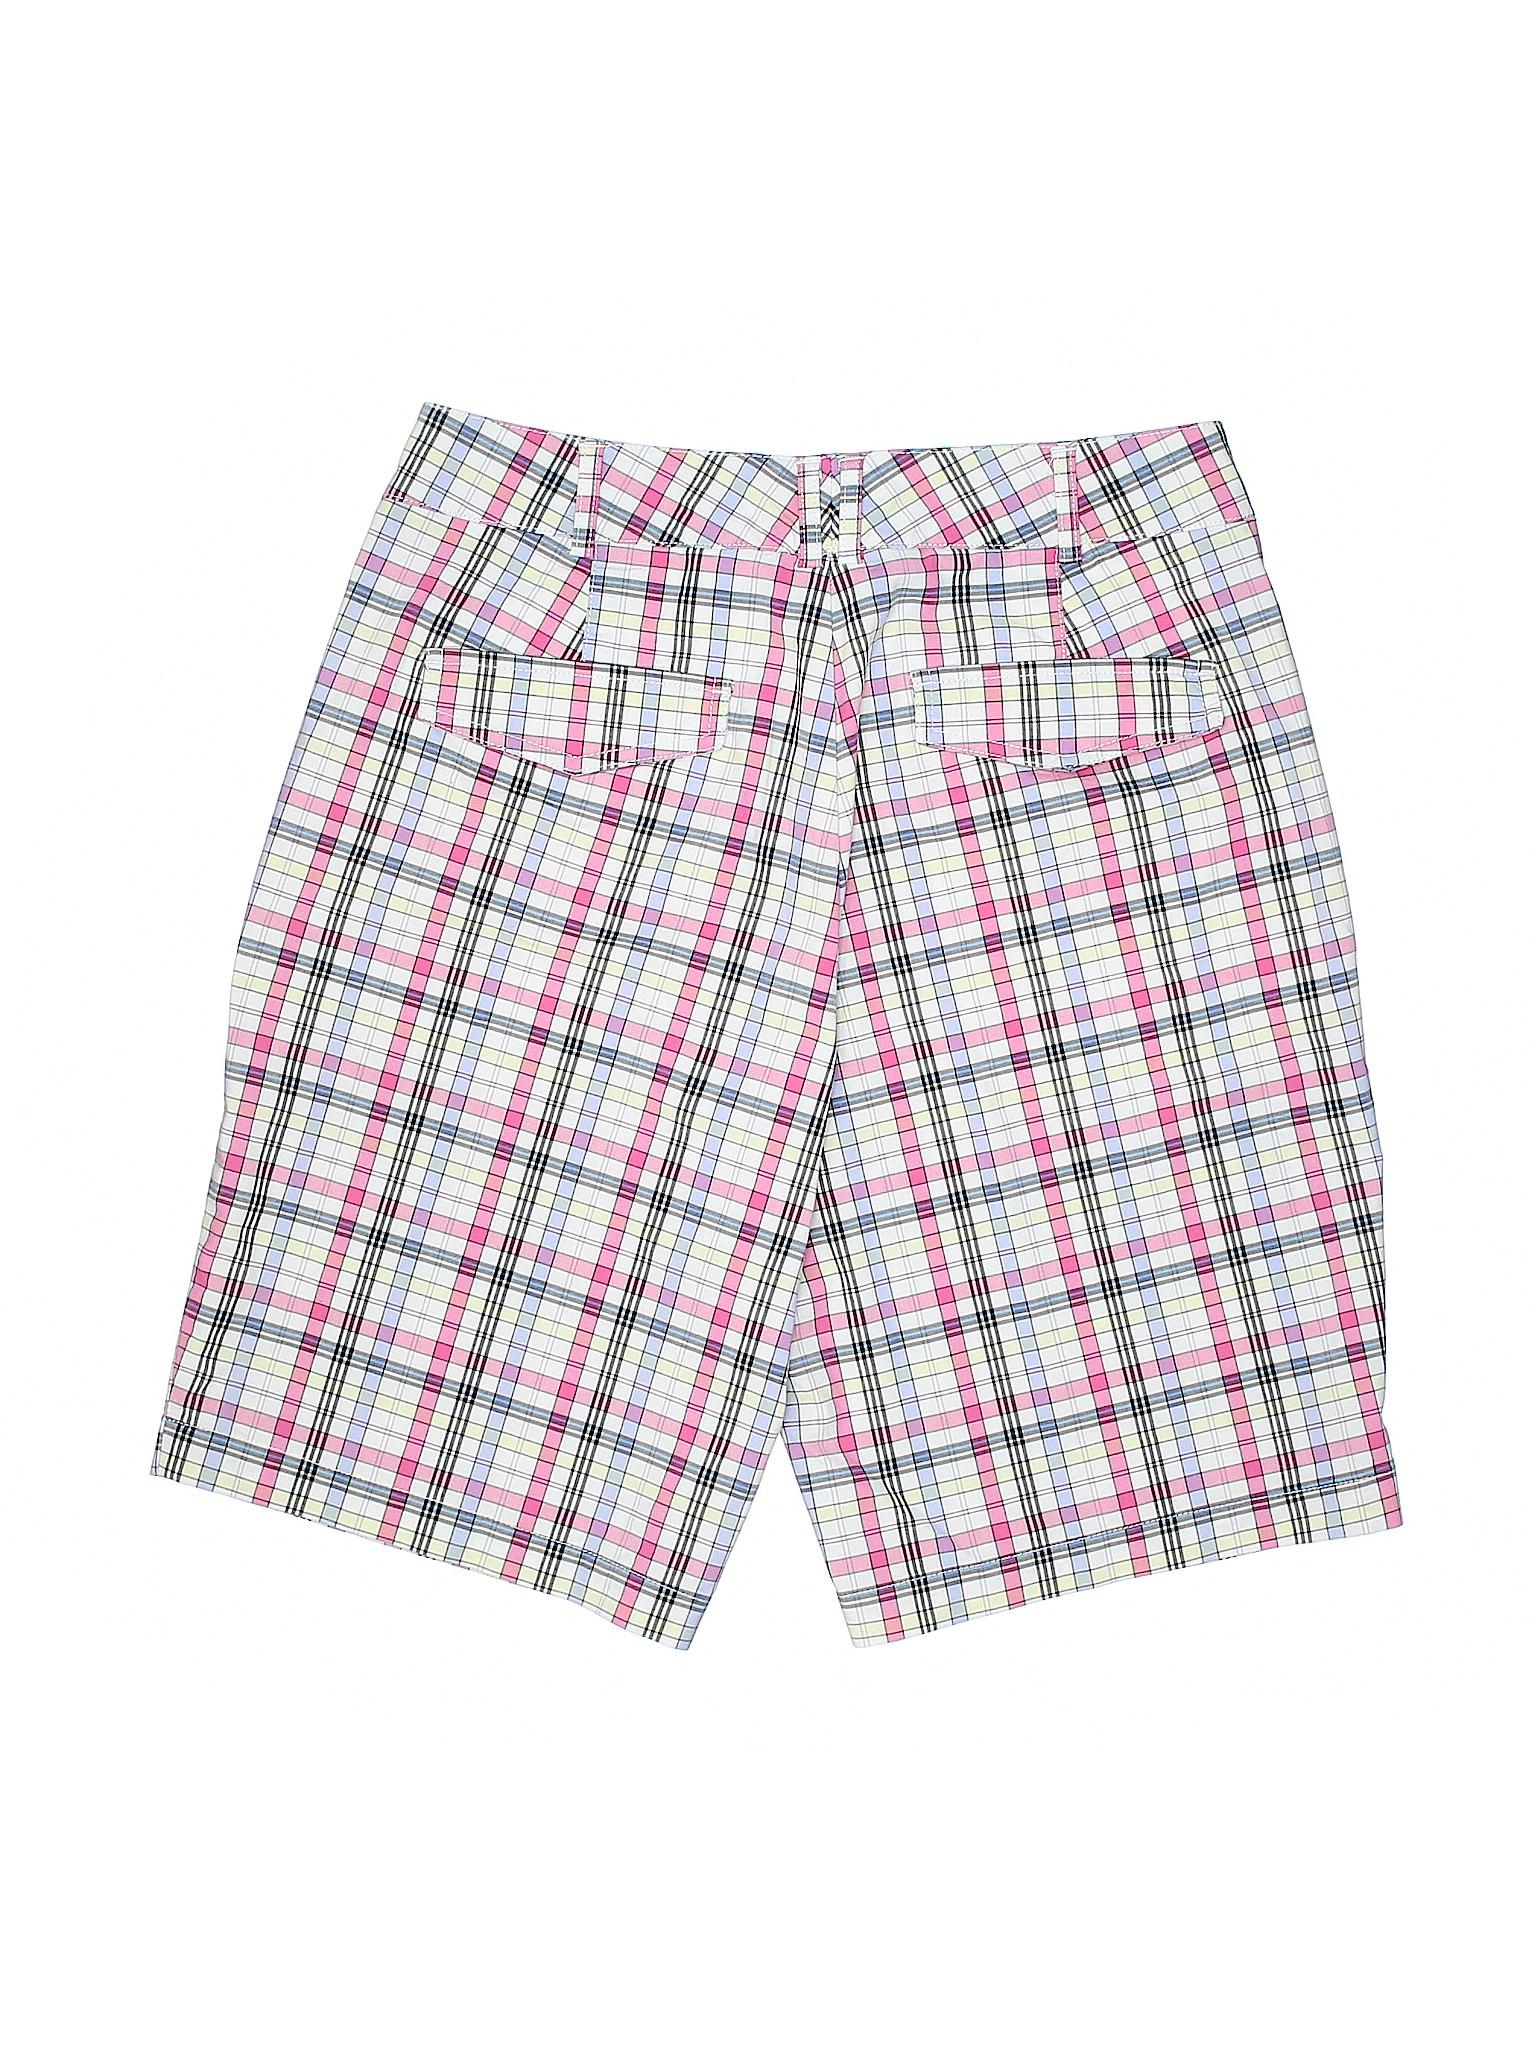 Boutique Boutique Khaki Shorts Khaki Shorts Dockers Boutique Dockers Khaki Shorts Dockers wq6HRA1